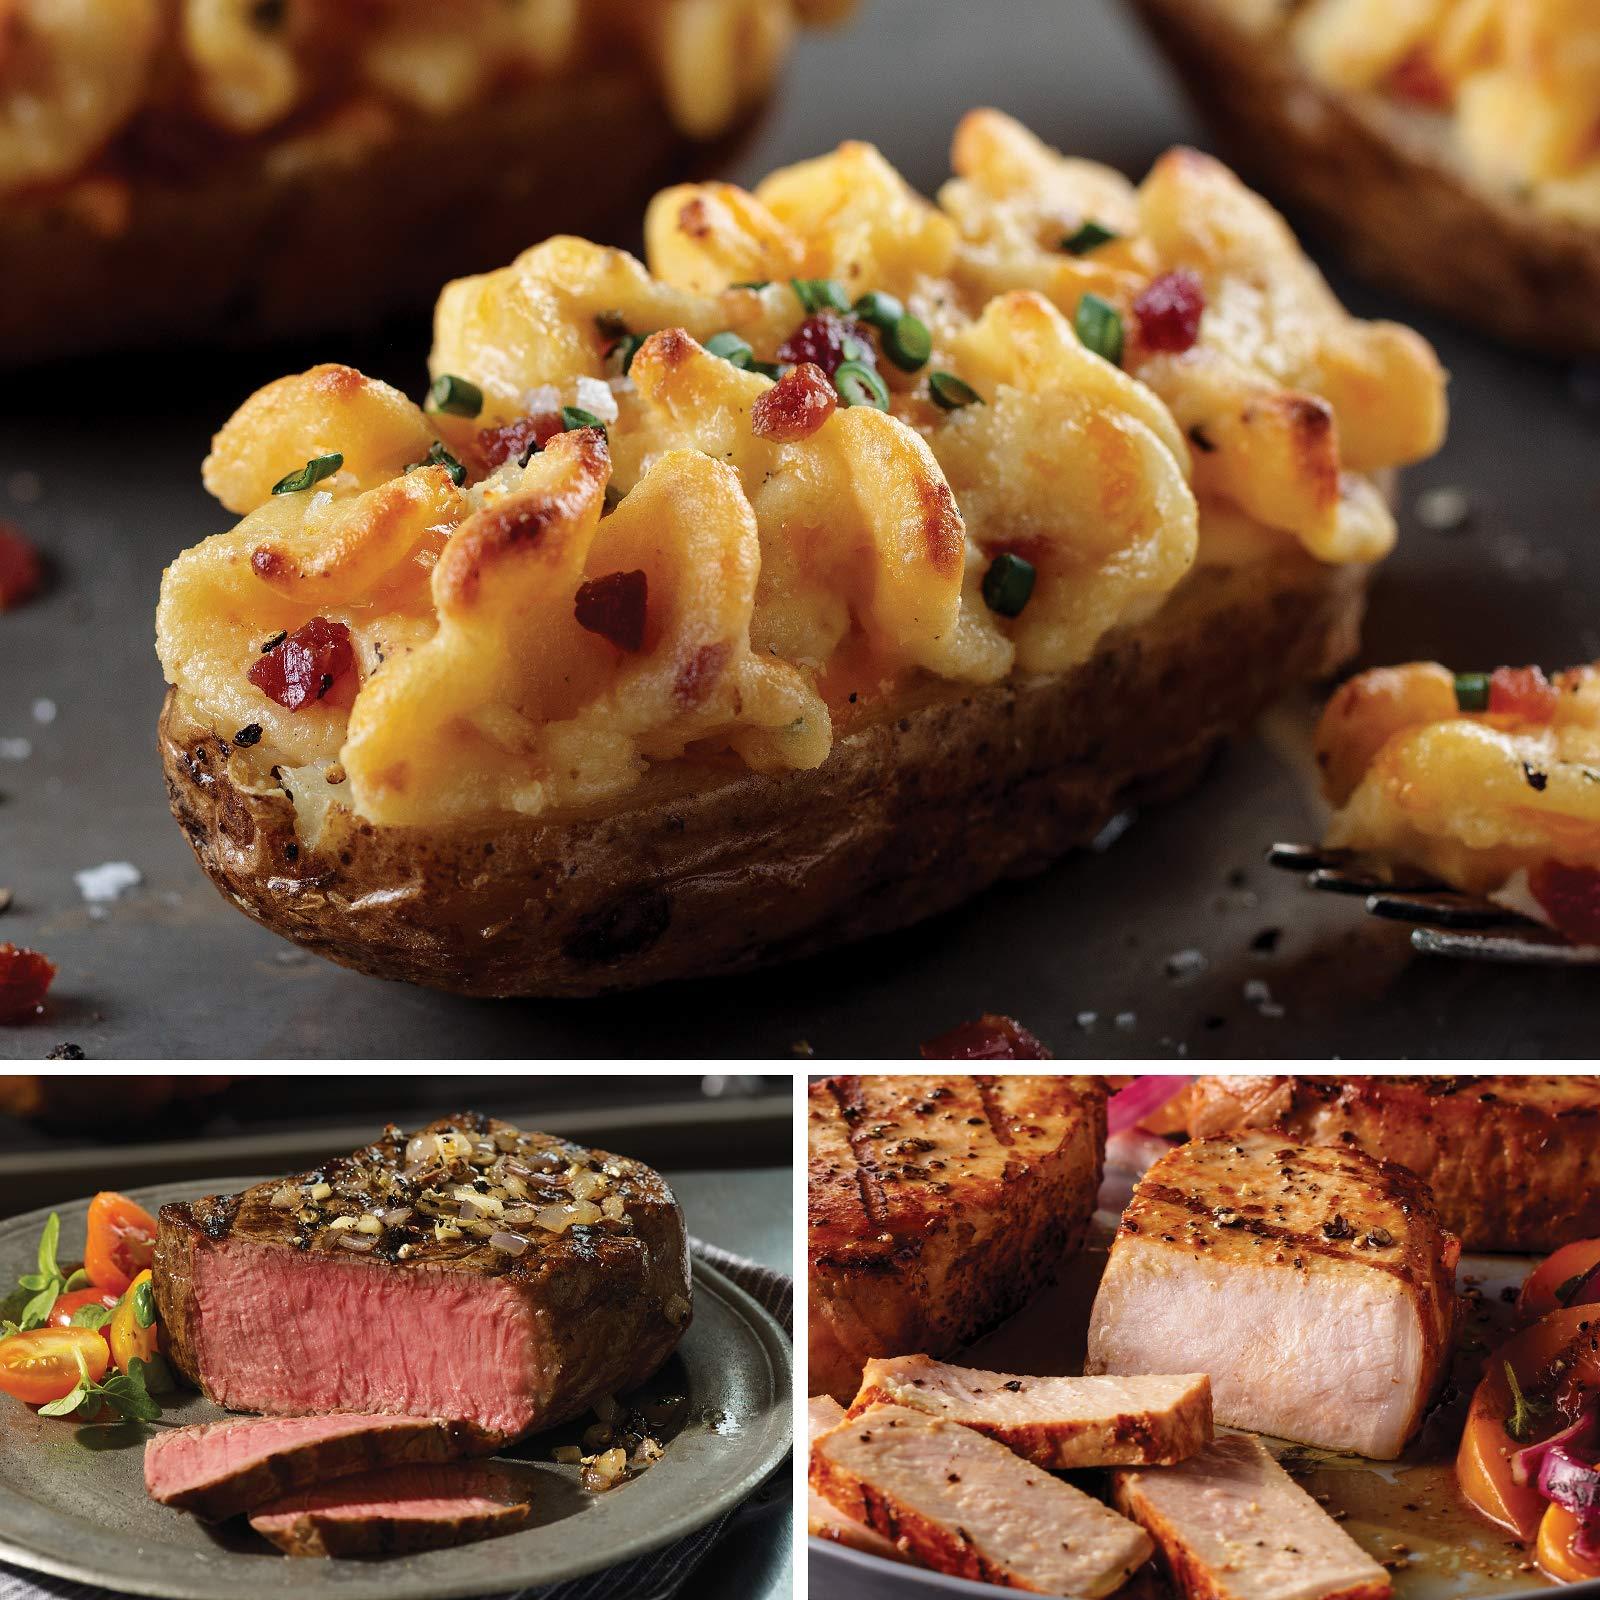 Omaha Steaks Complete Treat (12-Piece with Top Sirloins, Boneless Pork Chops, and Stuffed Baked Potatoes)